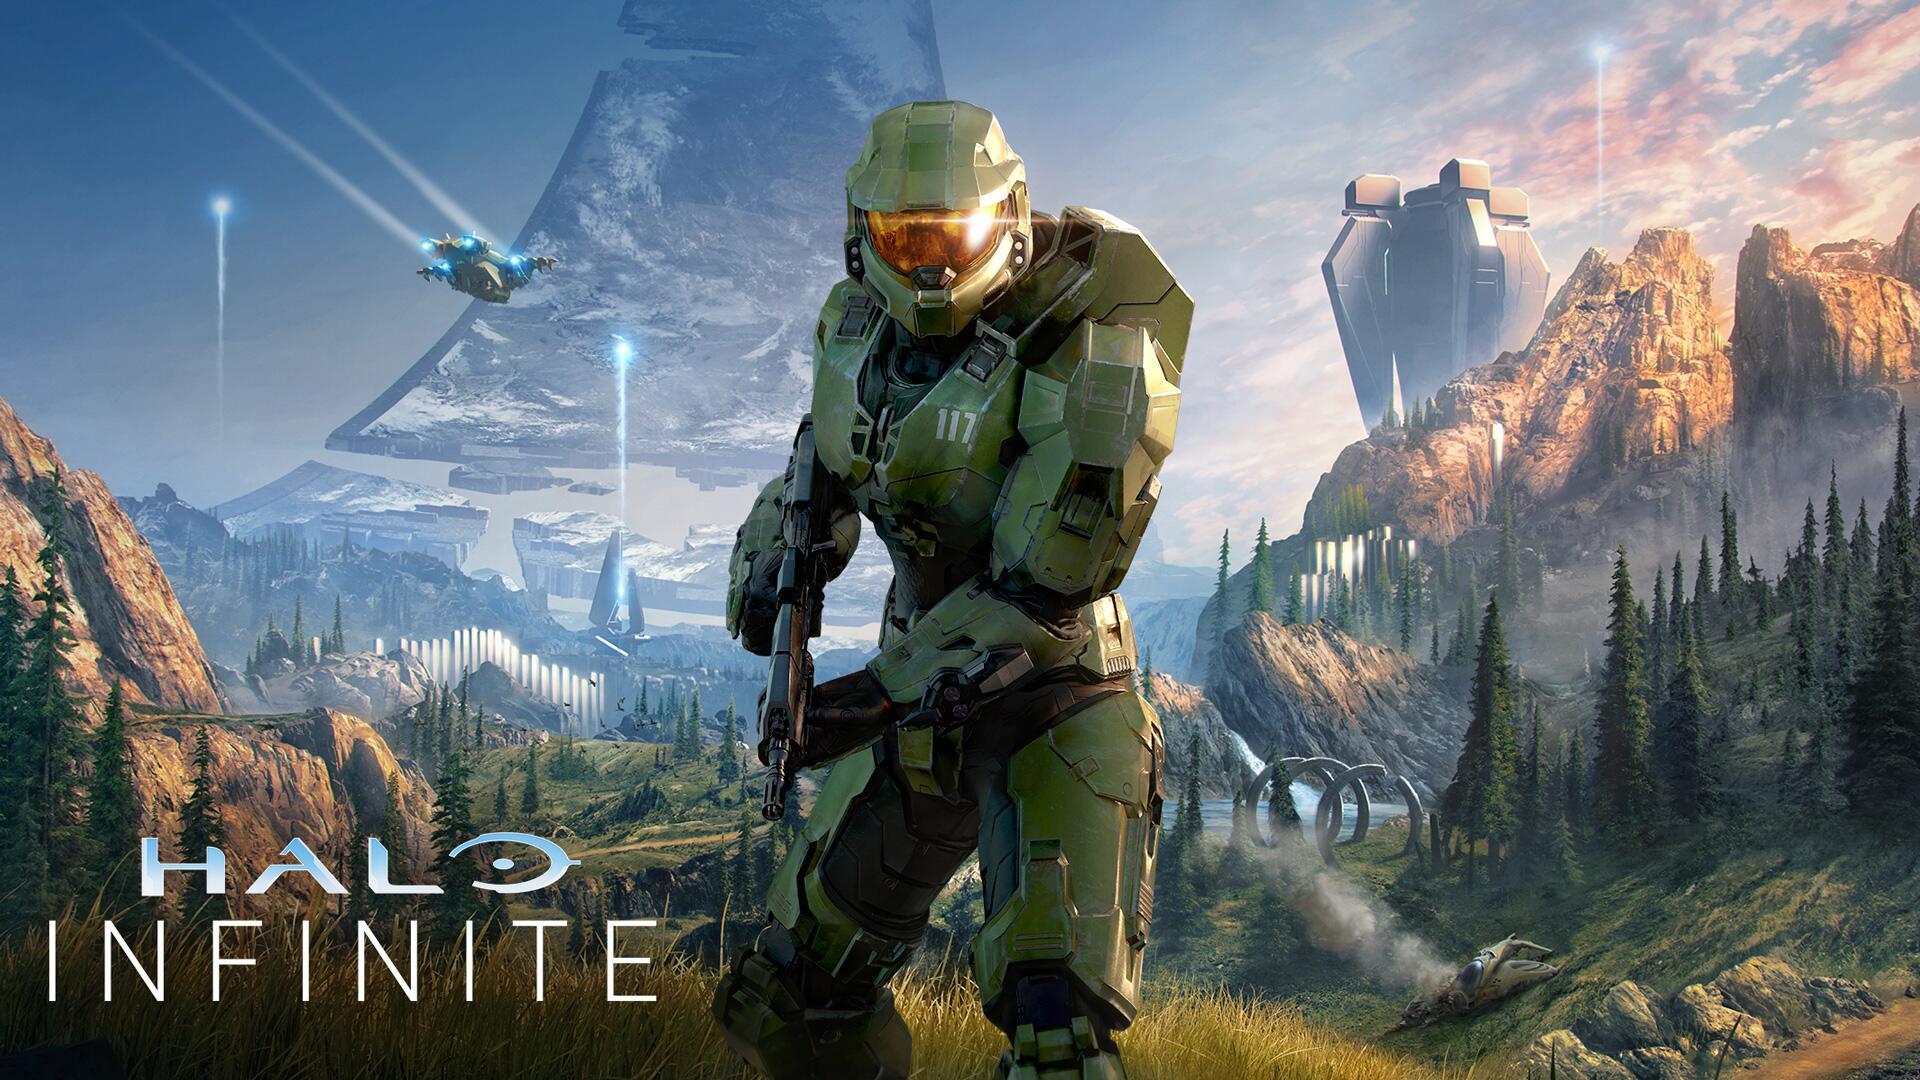 Bild zu Microsoft, Xbox, Series X, Konsole, Next-Gen, Halo, Stalker, Fable, Forza, Everwild